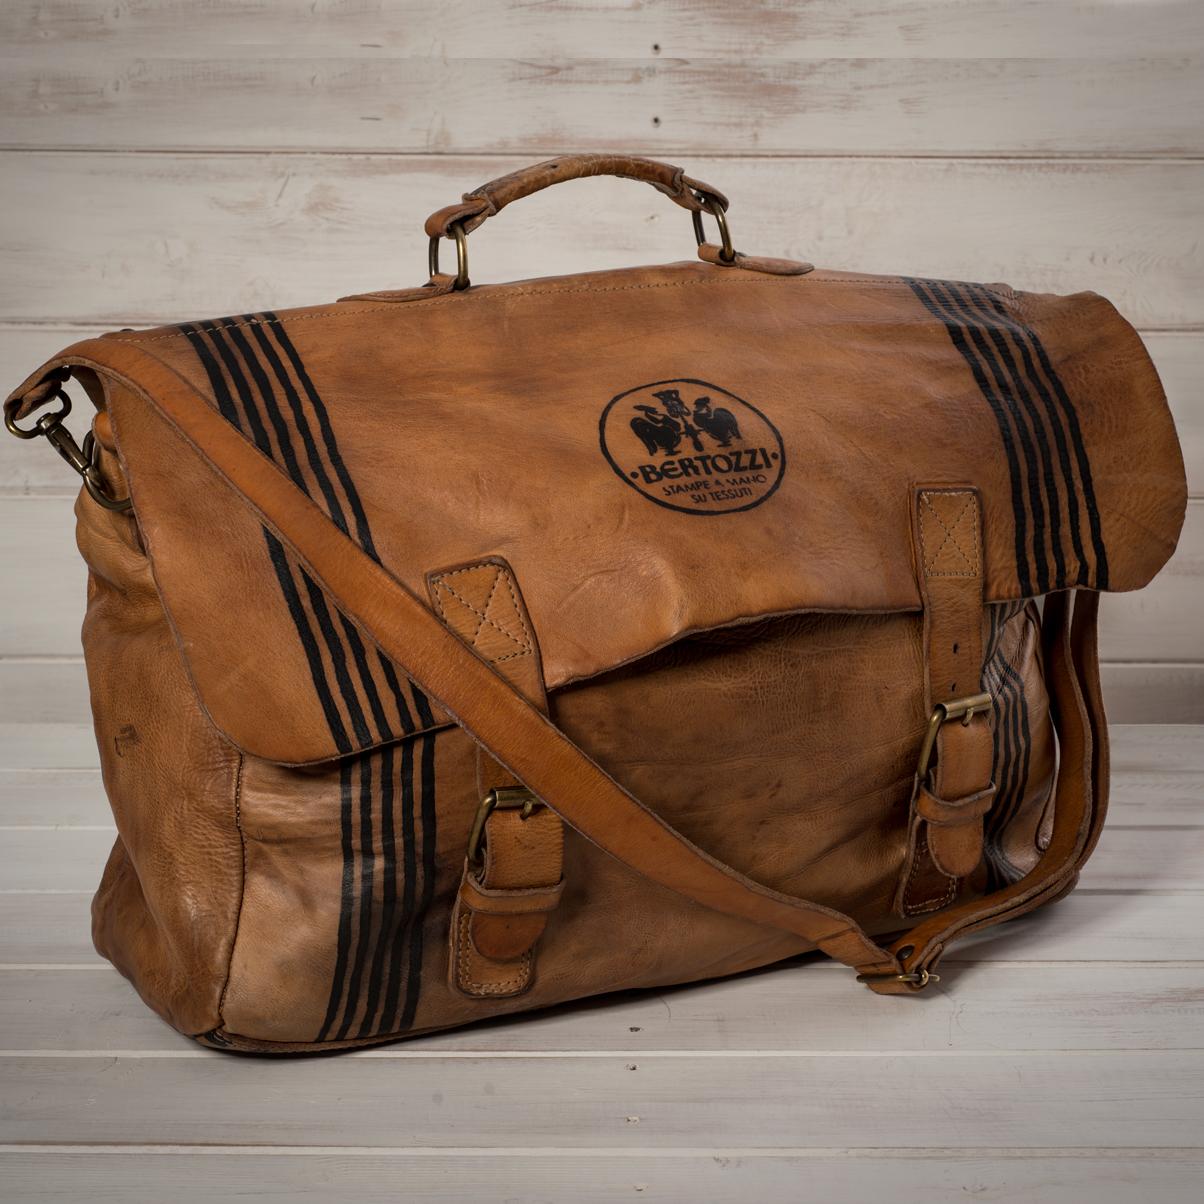 Italian artisan leather bags - AllÓRA